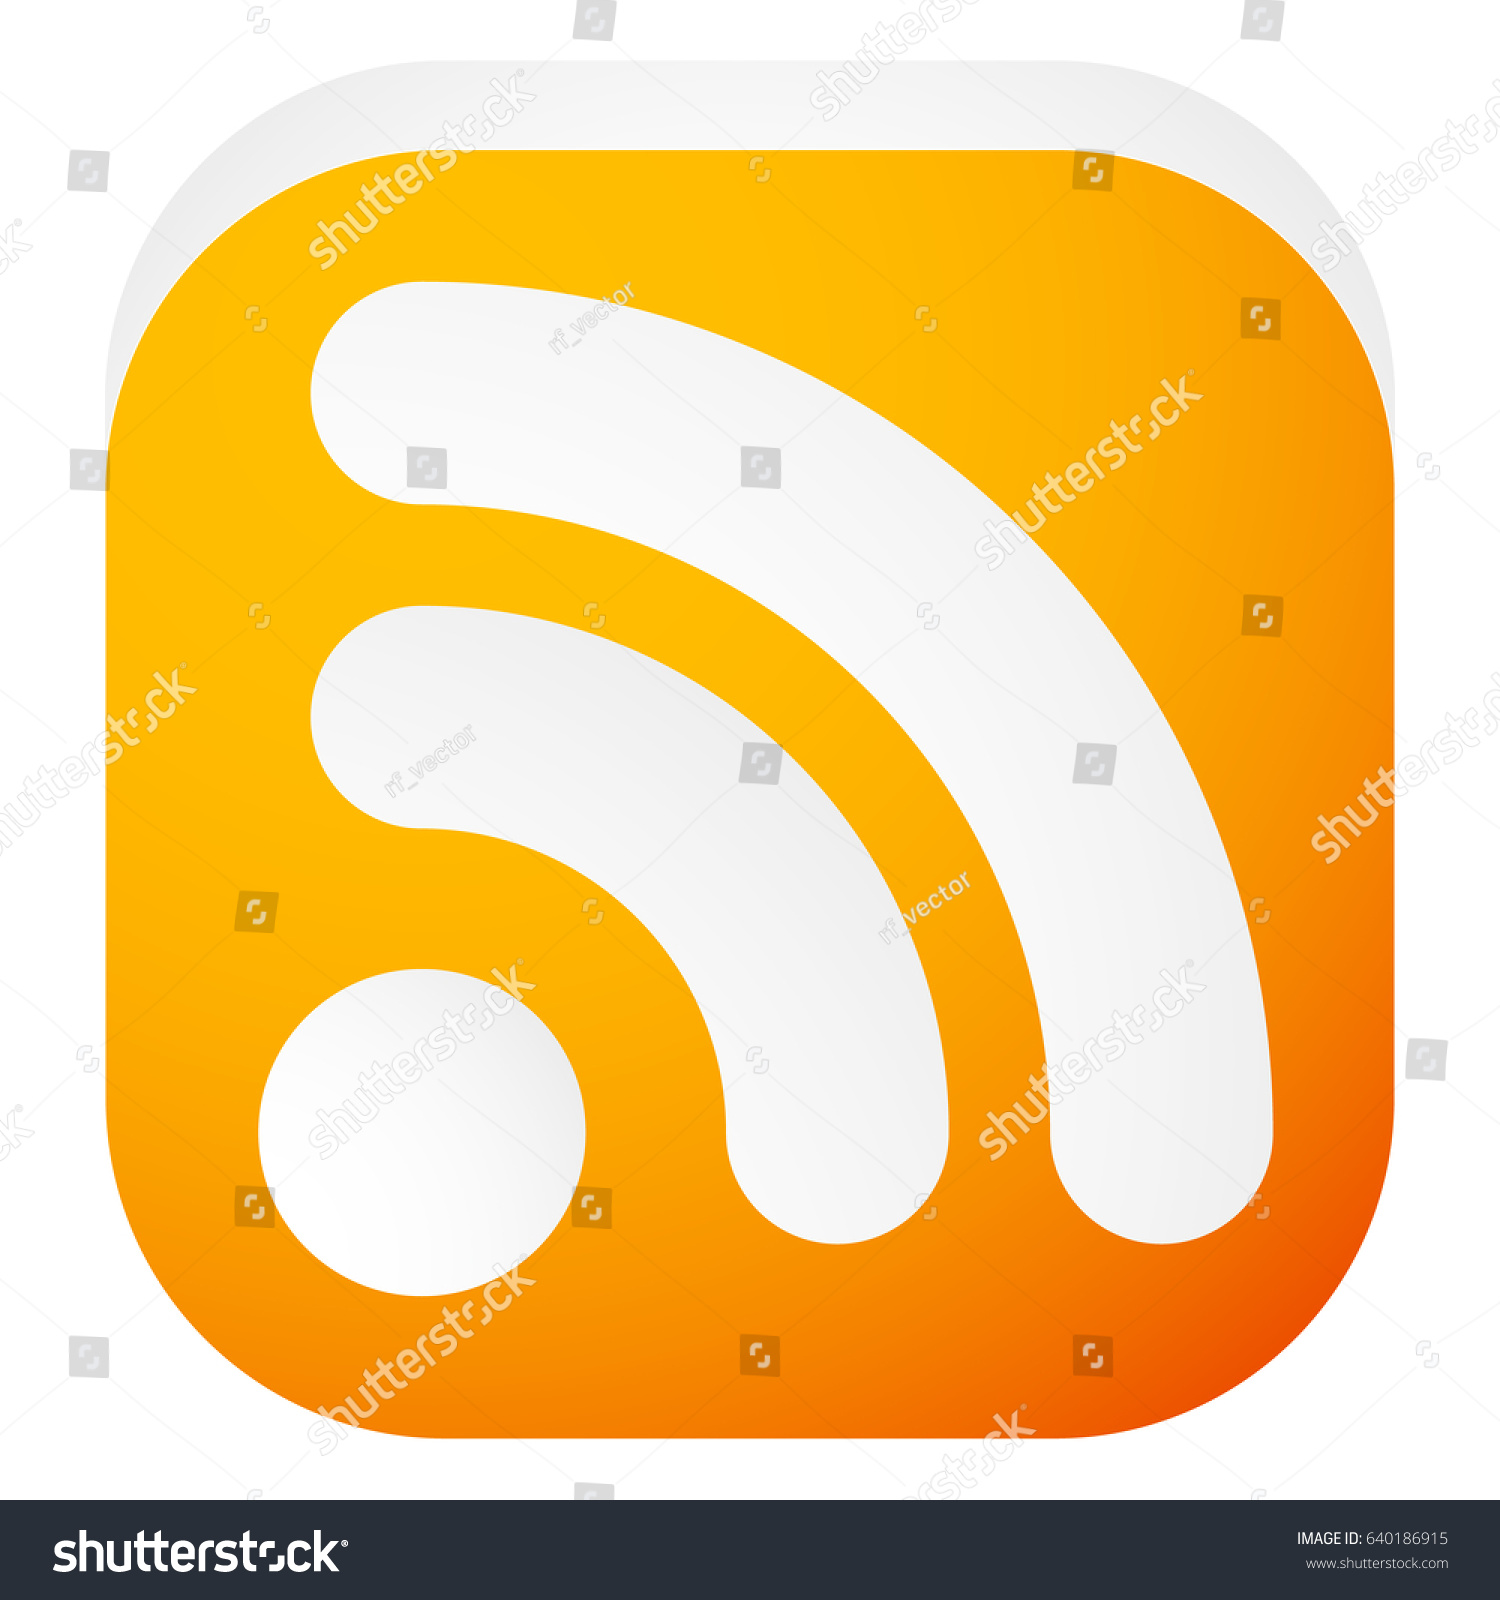 Generic signal rss feed icon symbol stock vector 640186915 generic signal or rss feed icon symbol for syndication wireless communication concepts biocorpaavc Choice Image